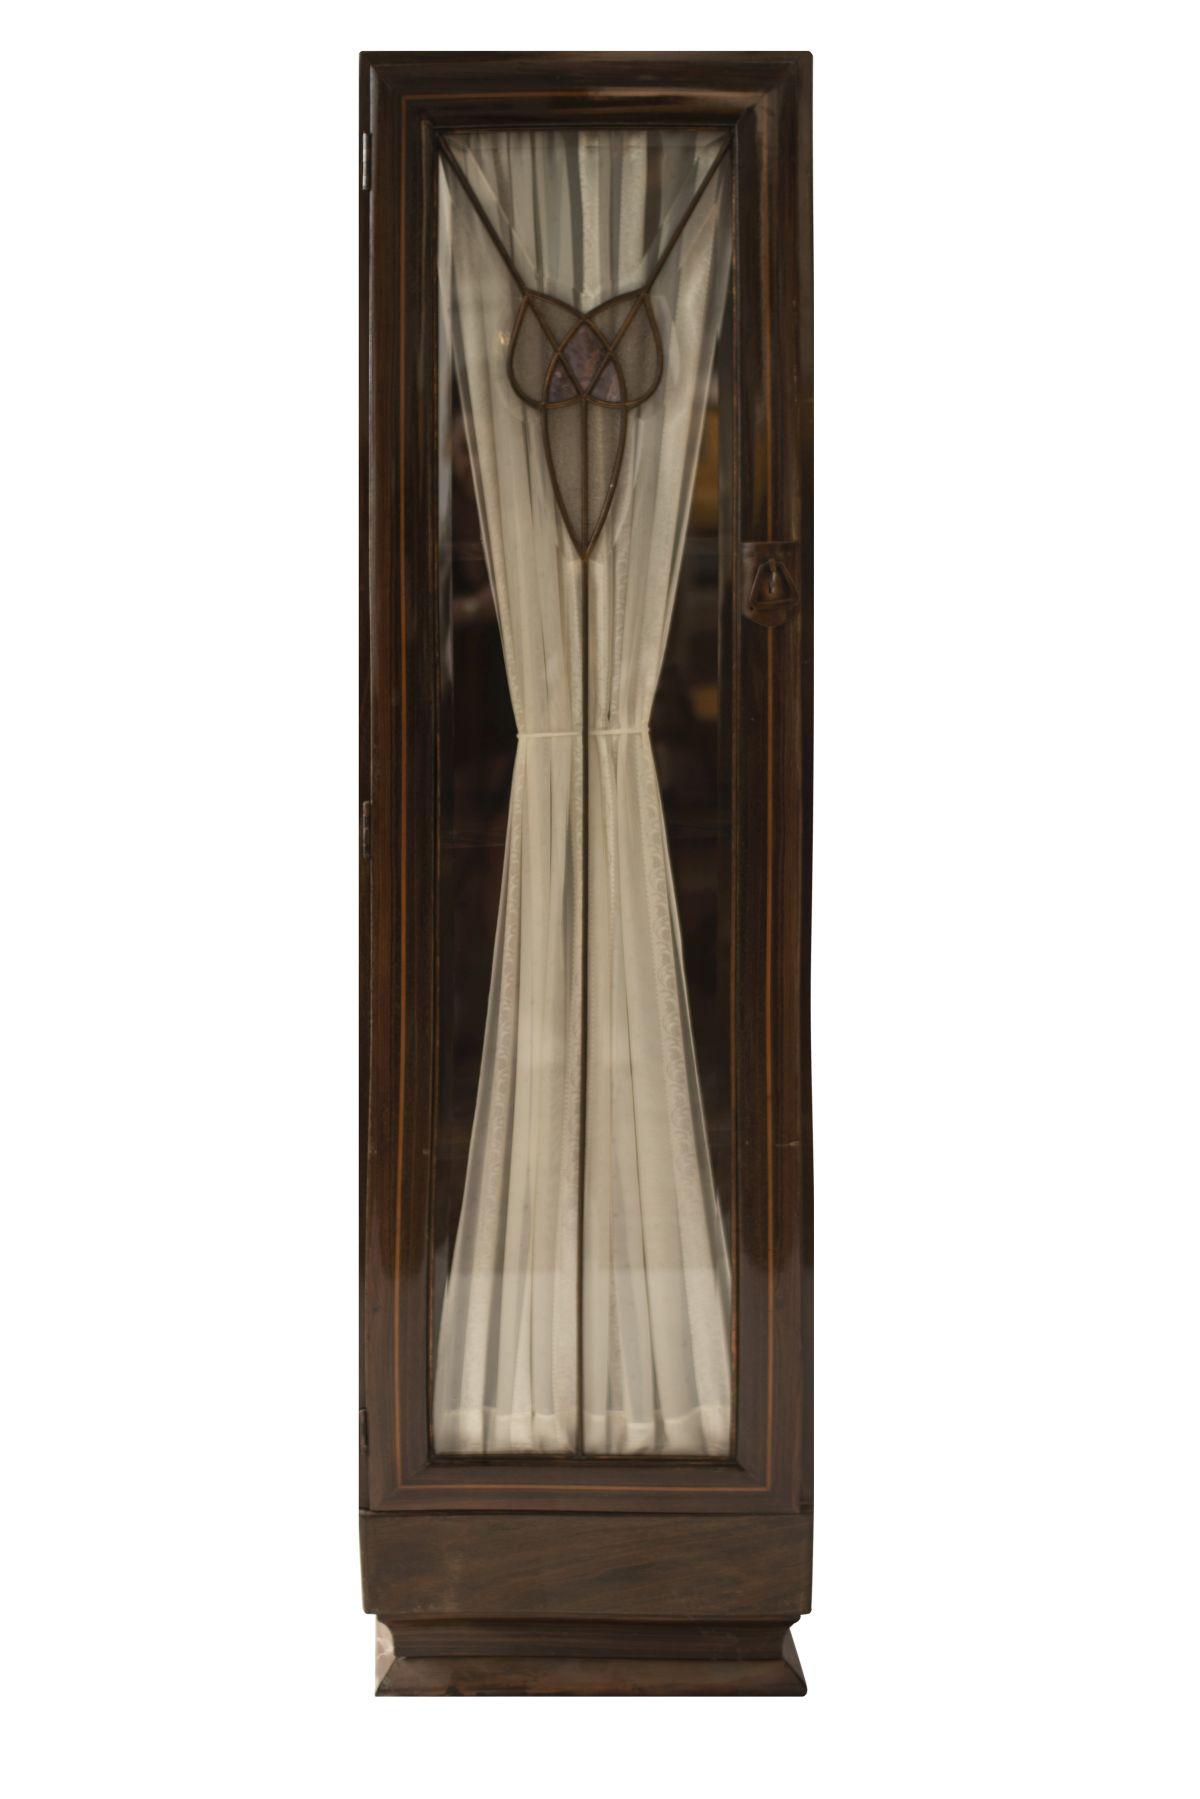 #25 2 Single-Door Showcase Cabinets   2 eintürige Vitrinenschränke Image